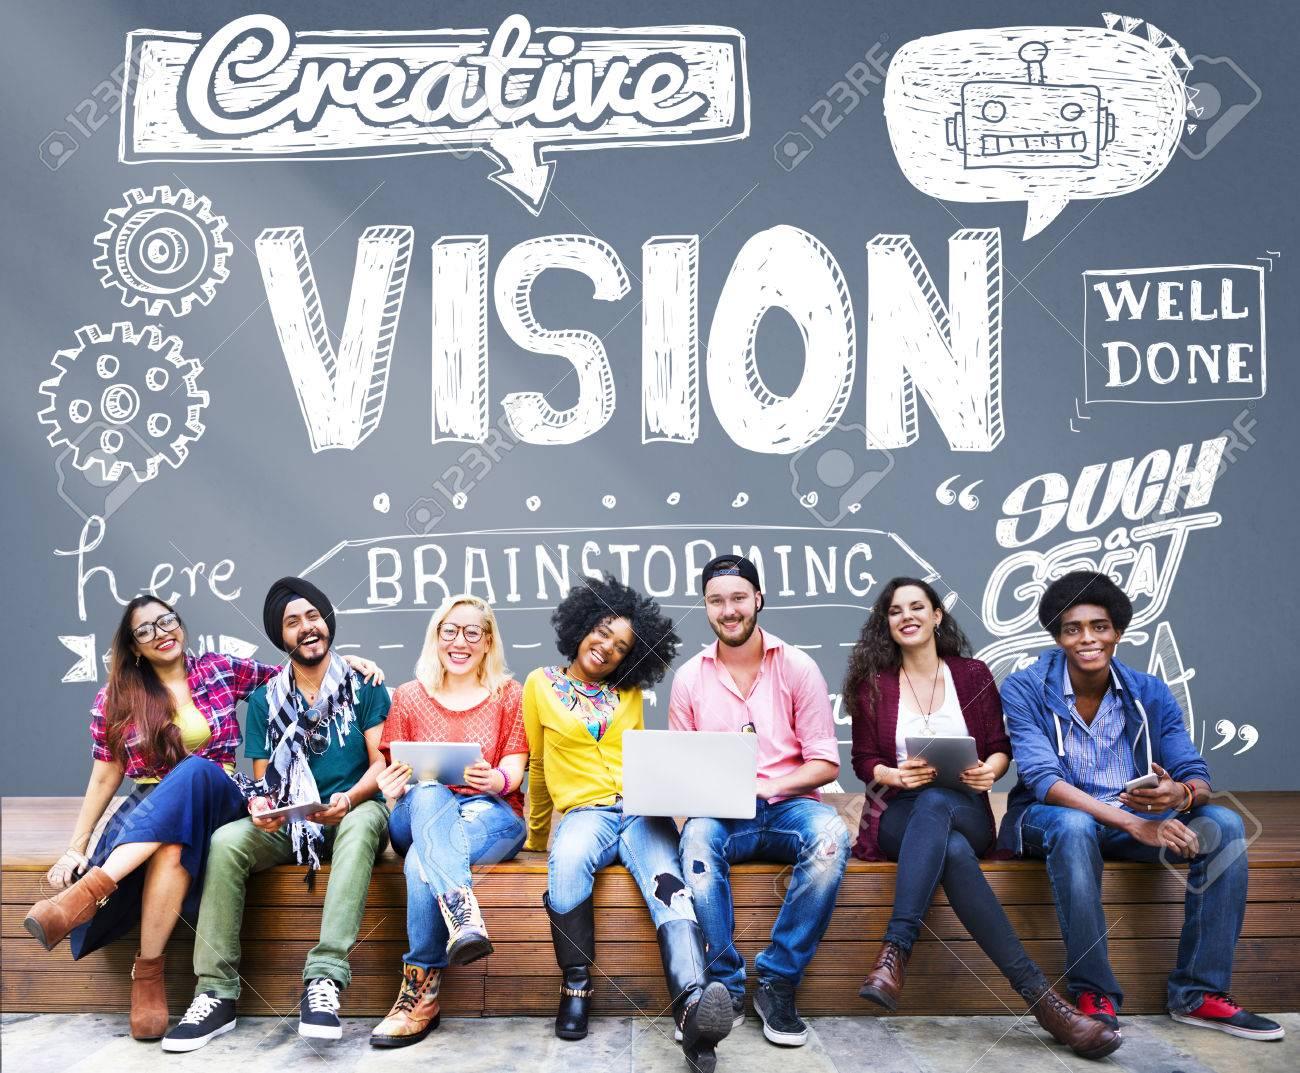 Vision Creative Ideas Inspiration Target Concept - 53560486